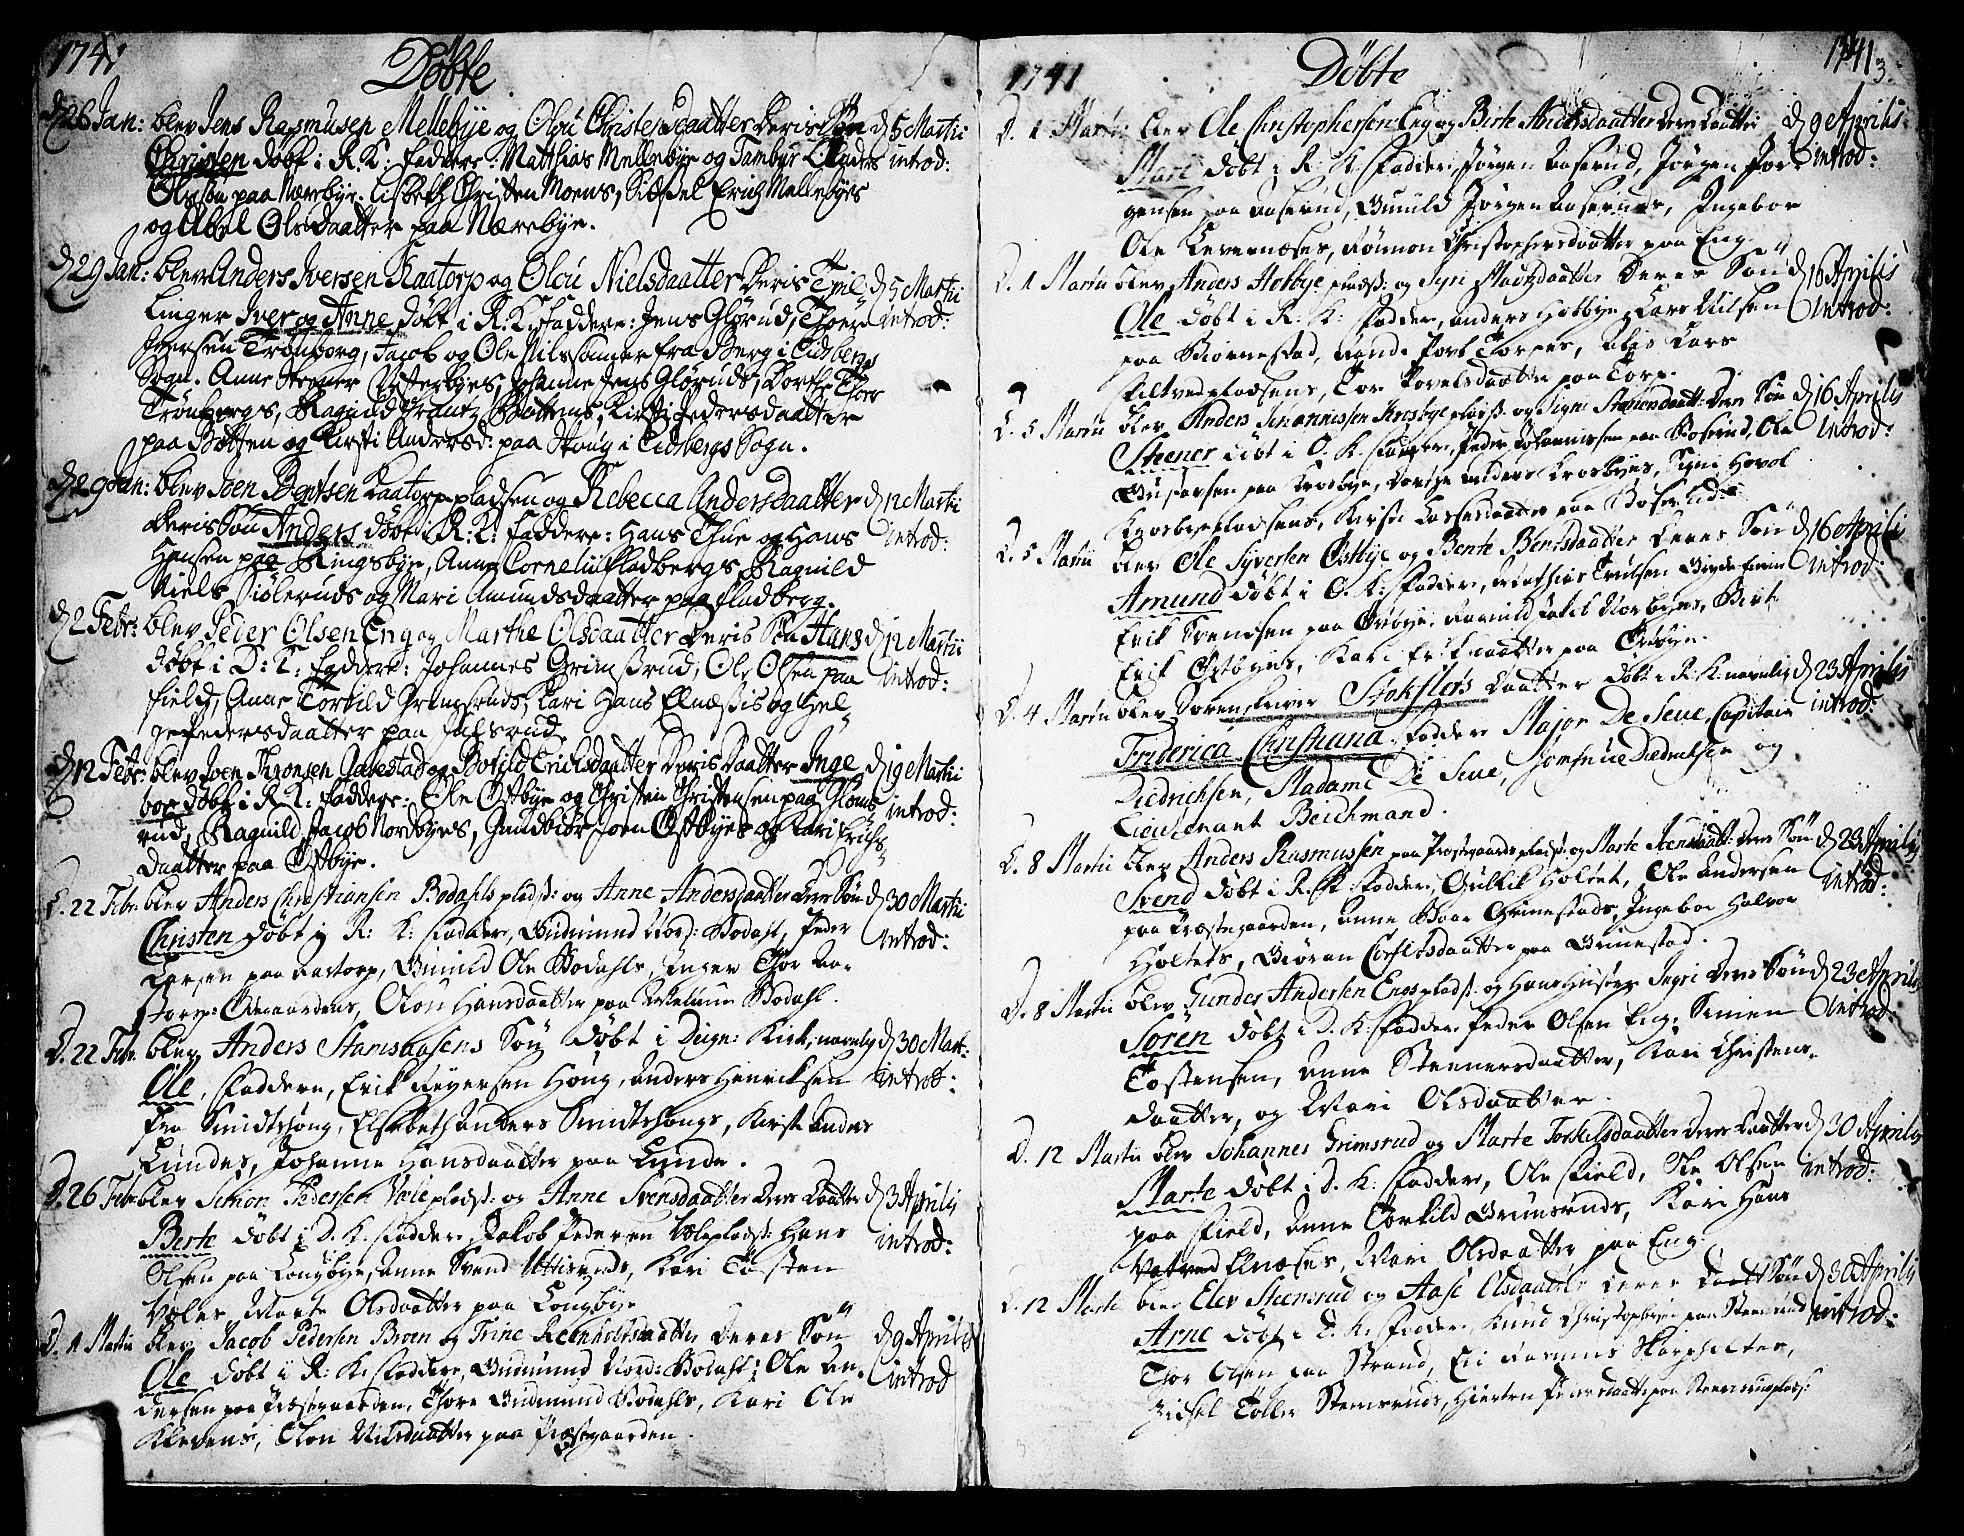 SAO, Rakkestad prestekontor Kirkebøker, F/Fa/L0002: Ministerialbok nr. I 2, 1741-1751, s. 3